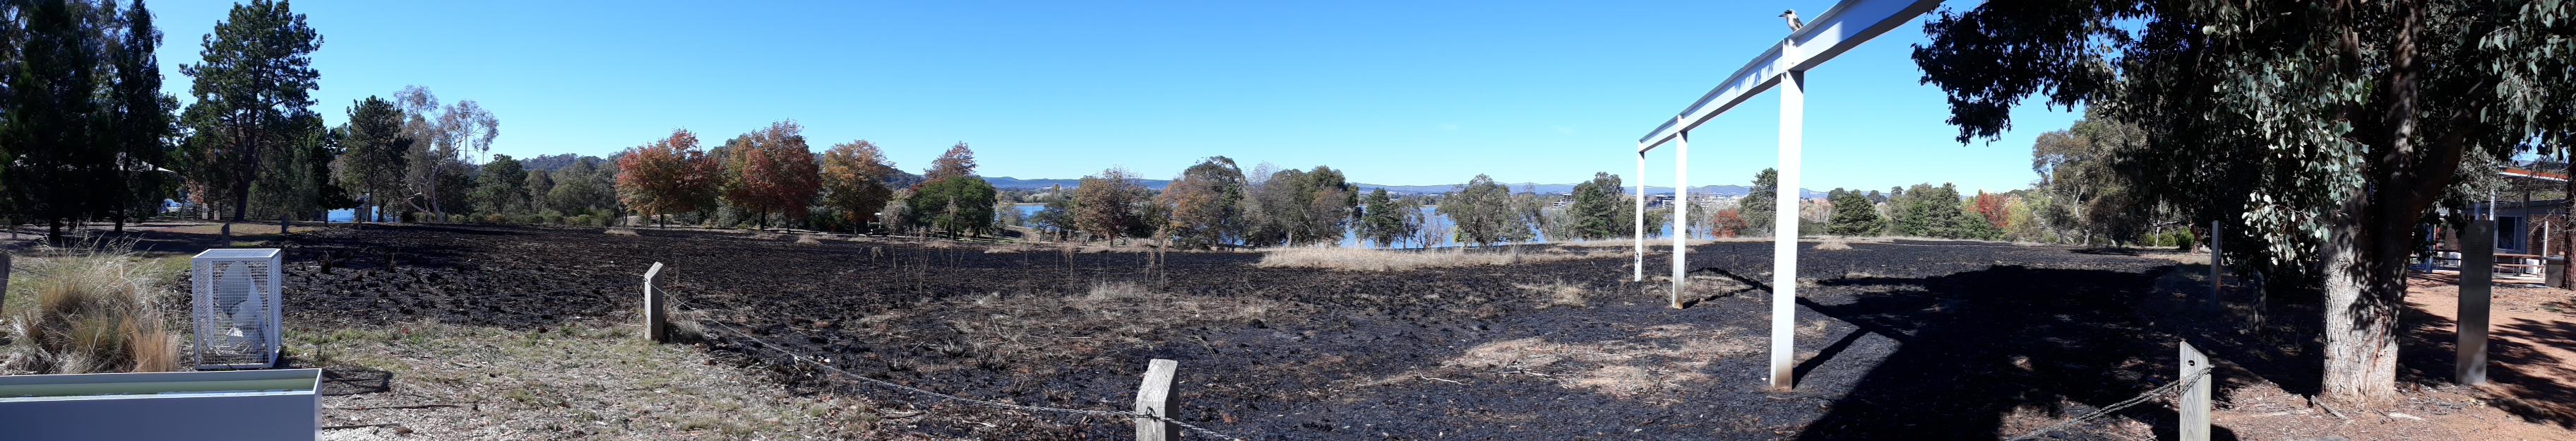 Areas of burnt grassland